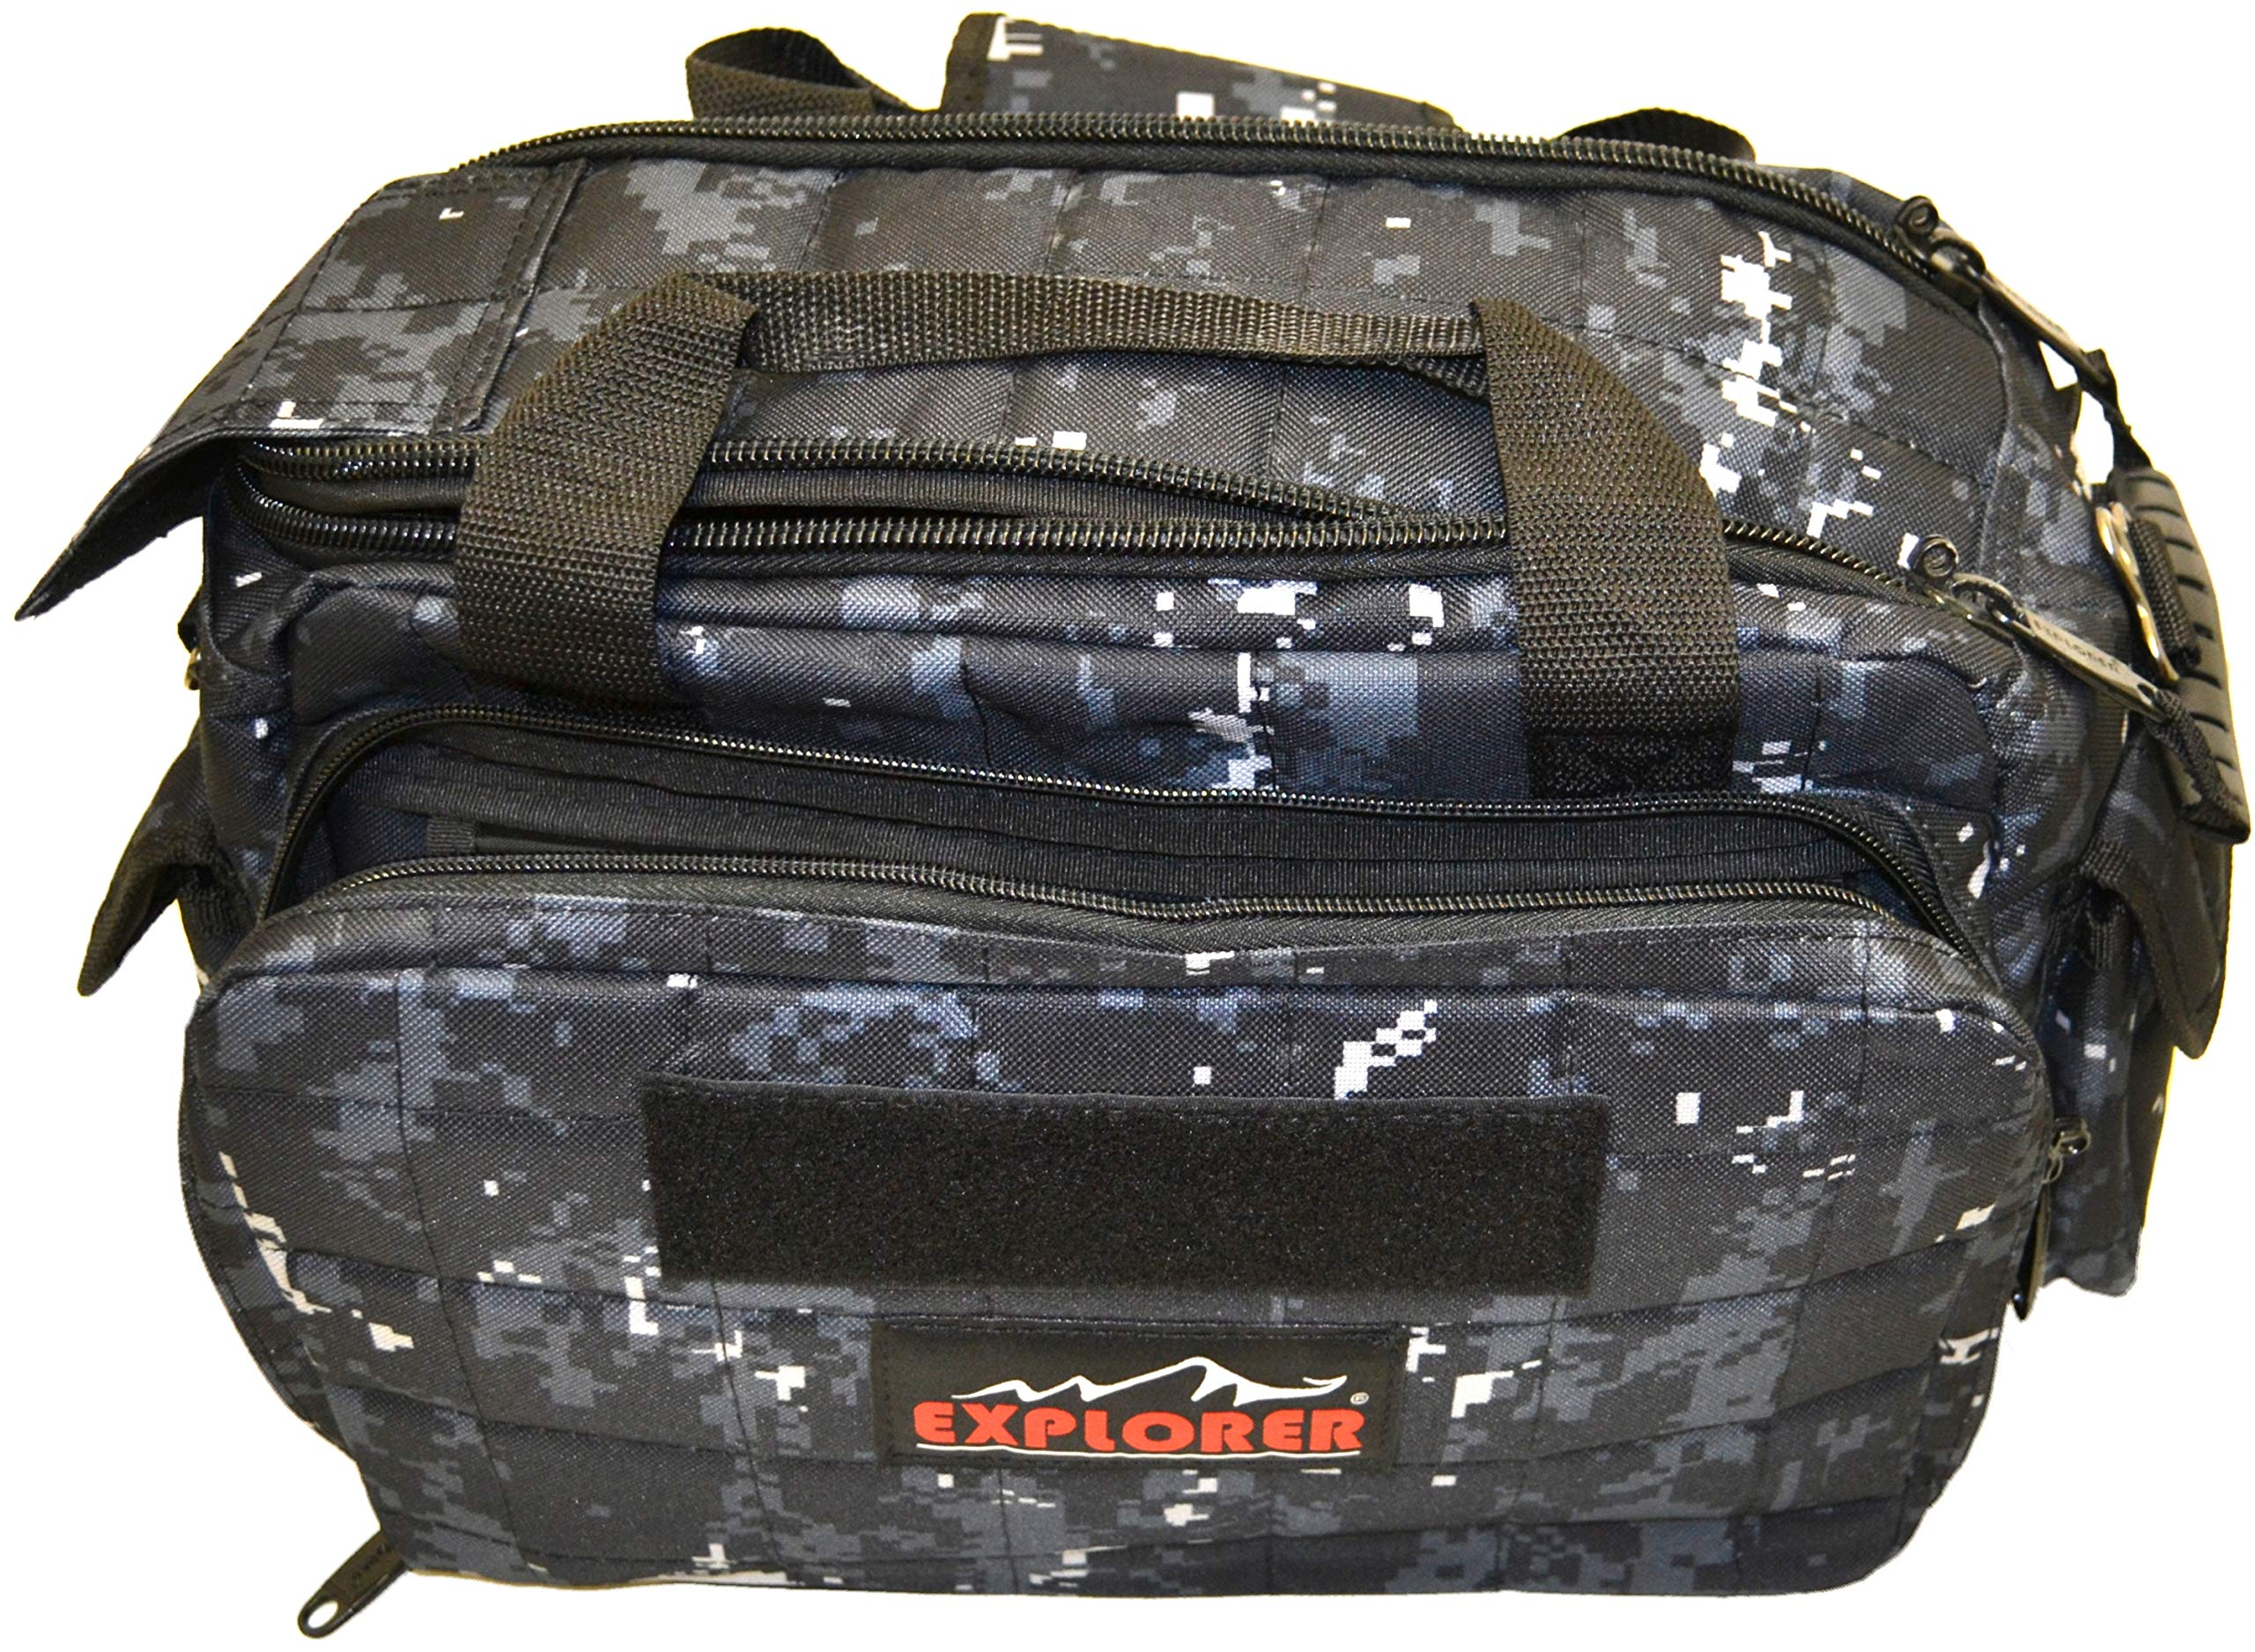 Explorer Tactical 12 Pistol Padded Gun and Gear Bag Navy Digital by Explorer